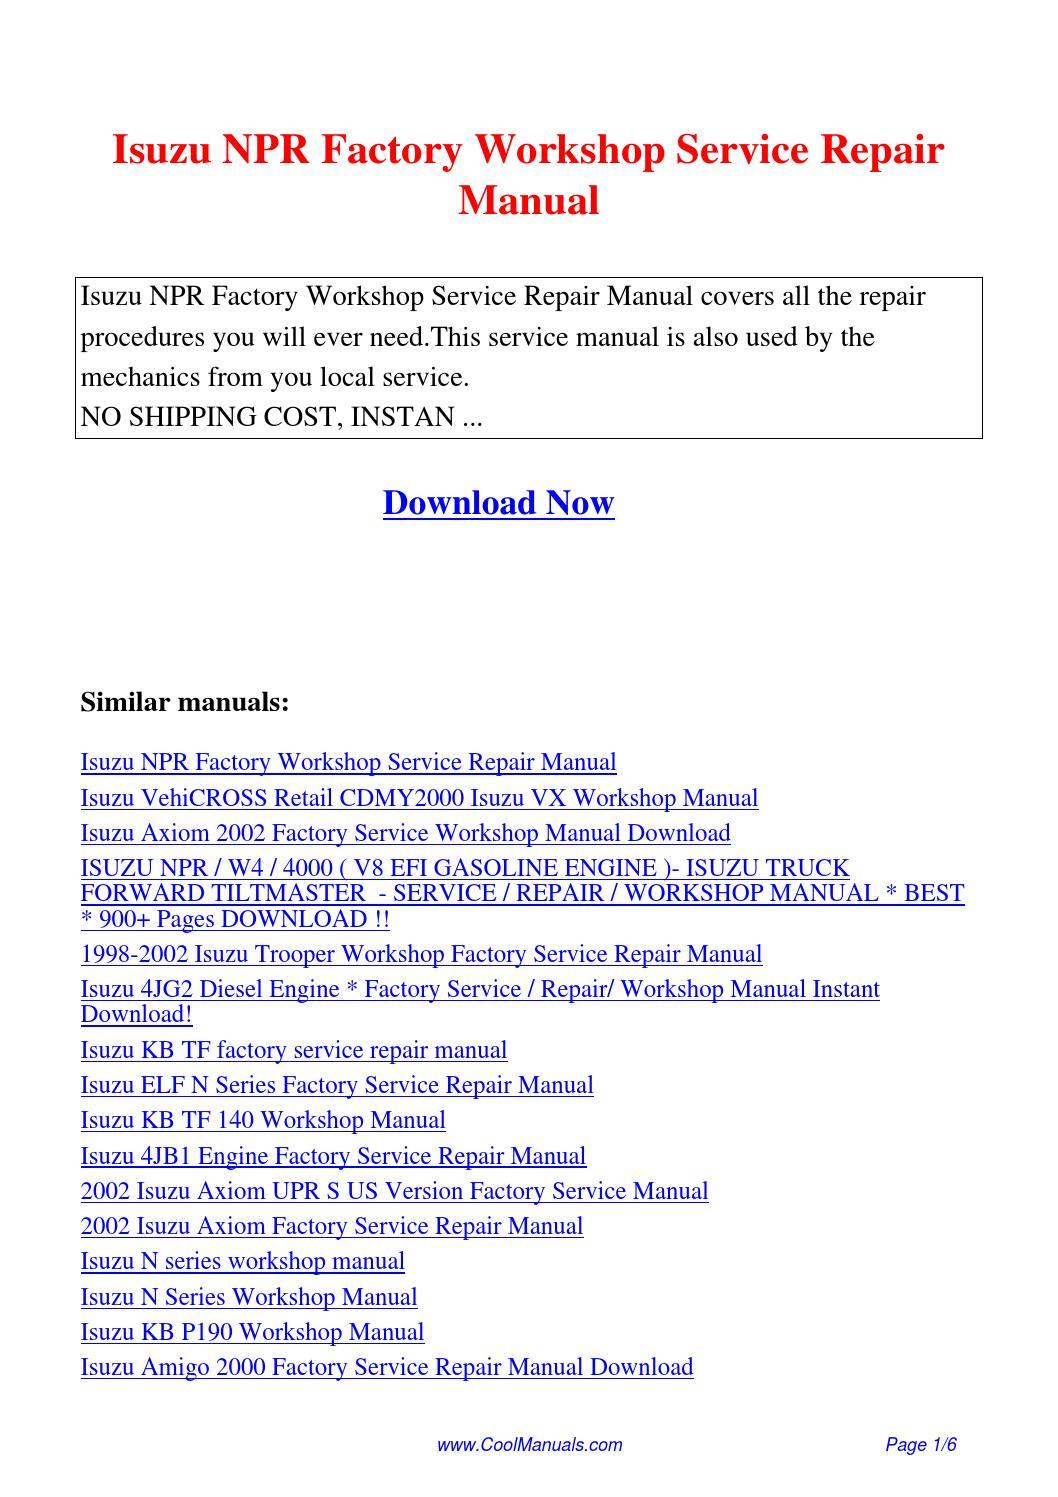 Isuzu NPR Factory Workshop Service Repair Manual.pdf by Guang Hui - issuu